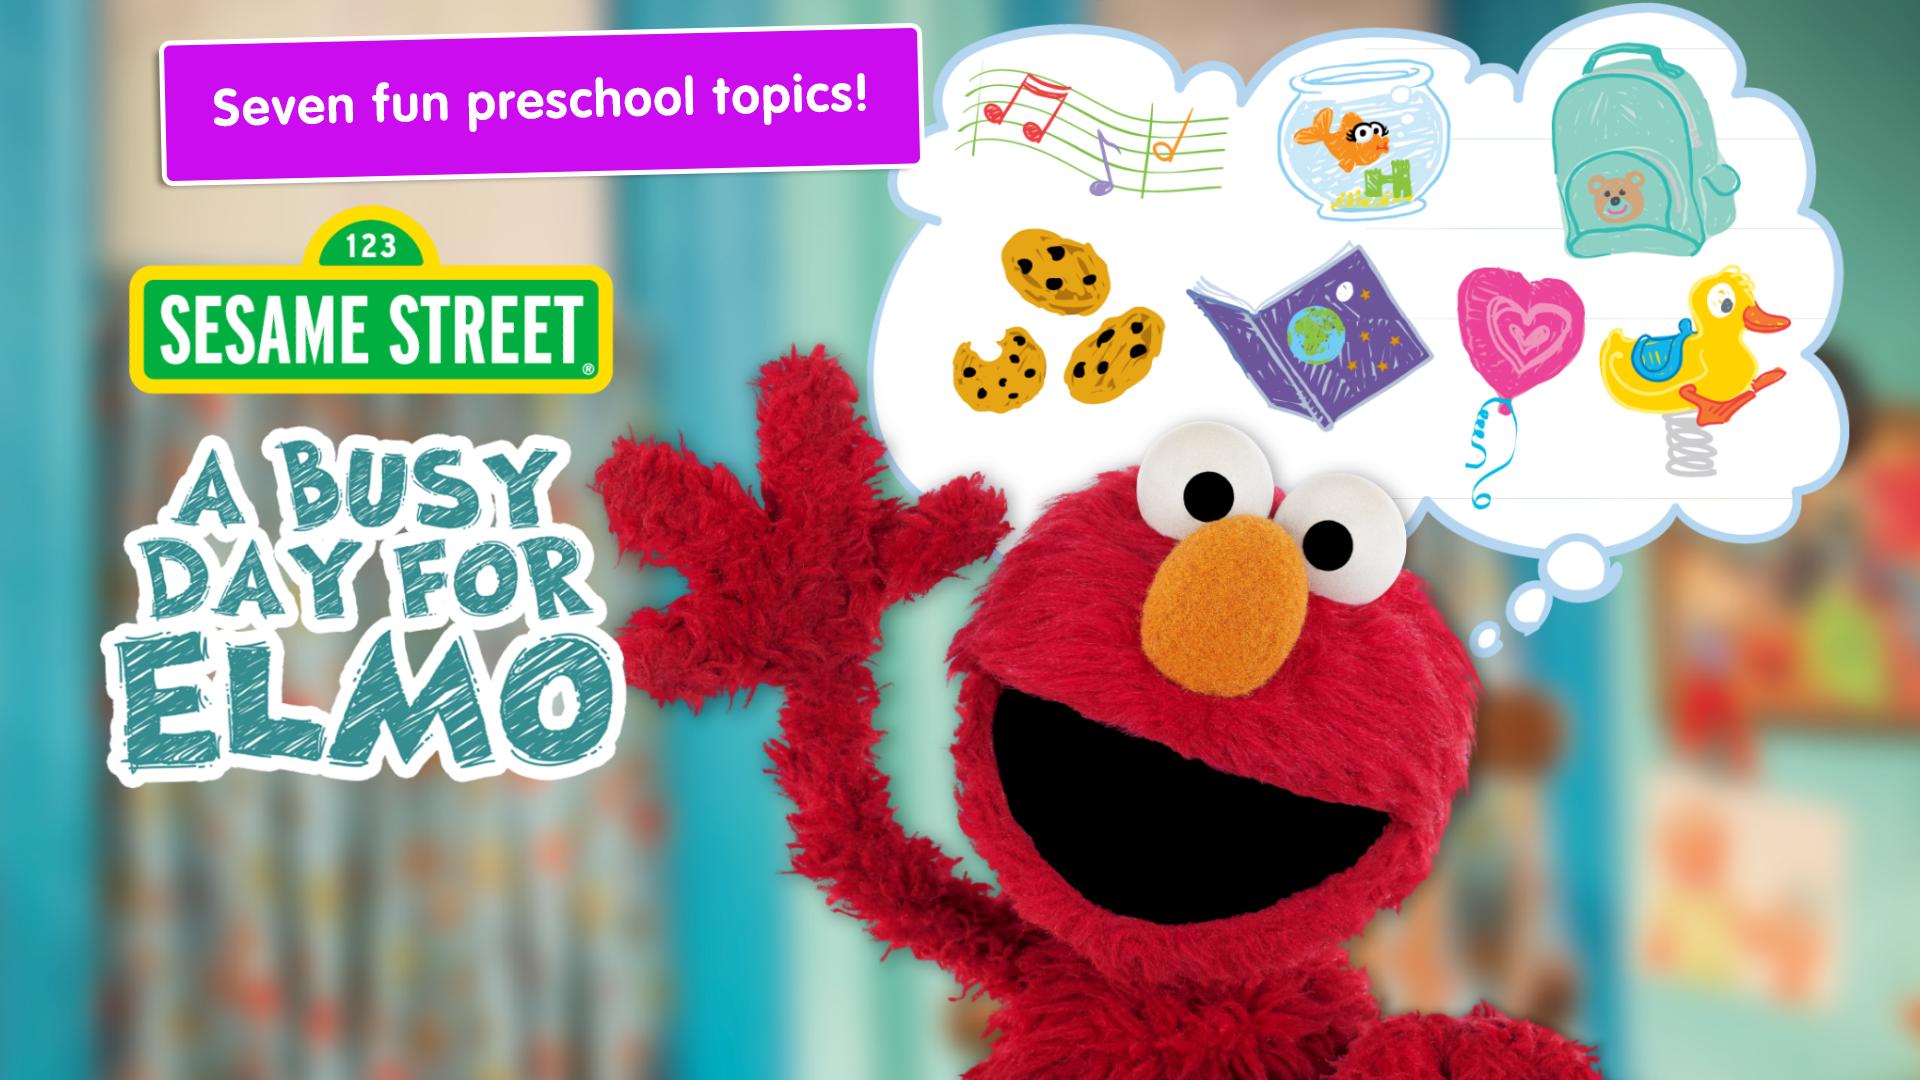 A Busy Day for Elmo: Sesame Street Video Calls screenshot 11